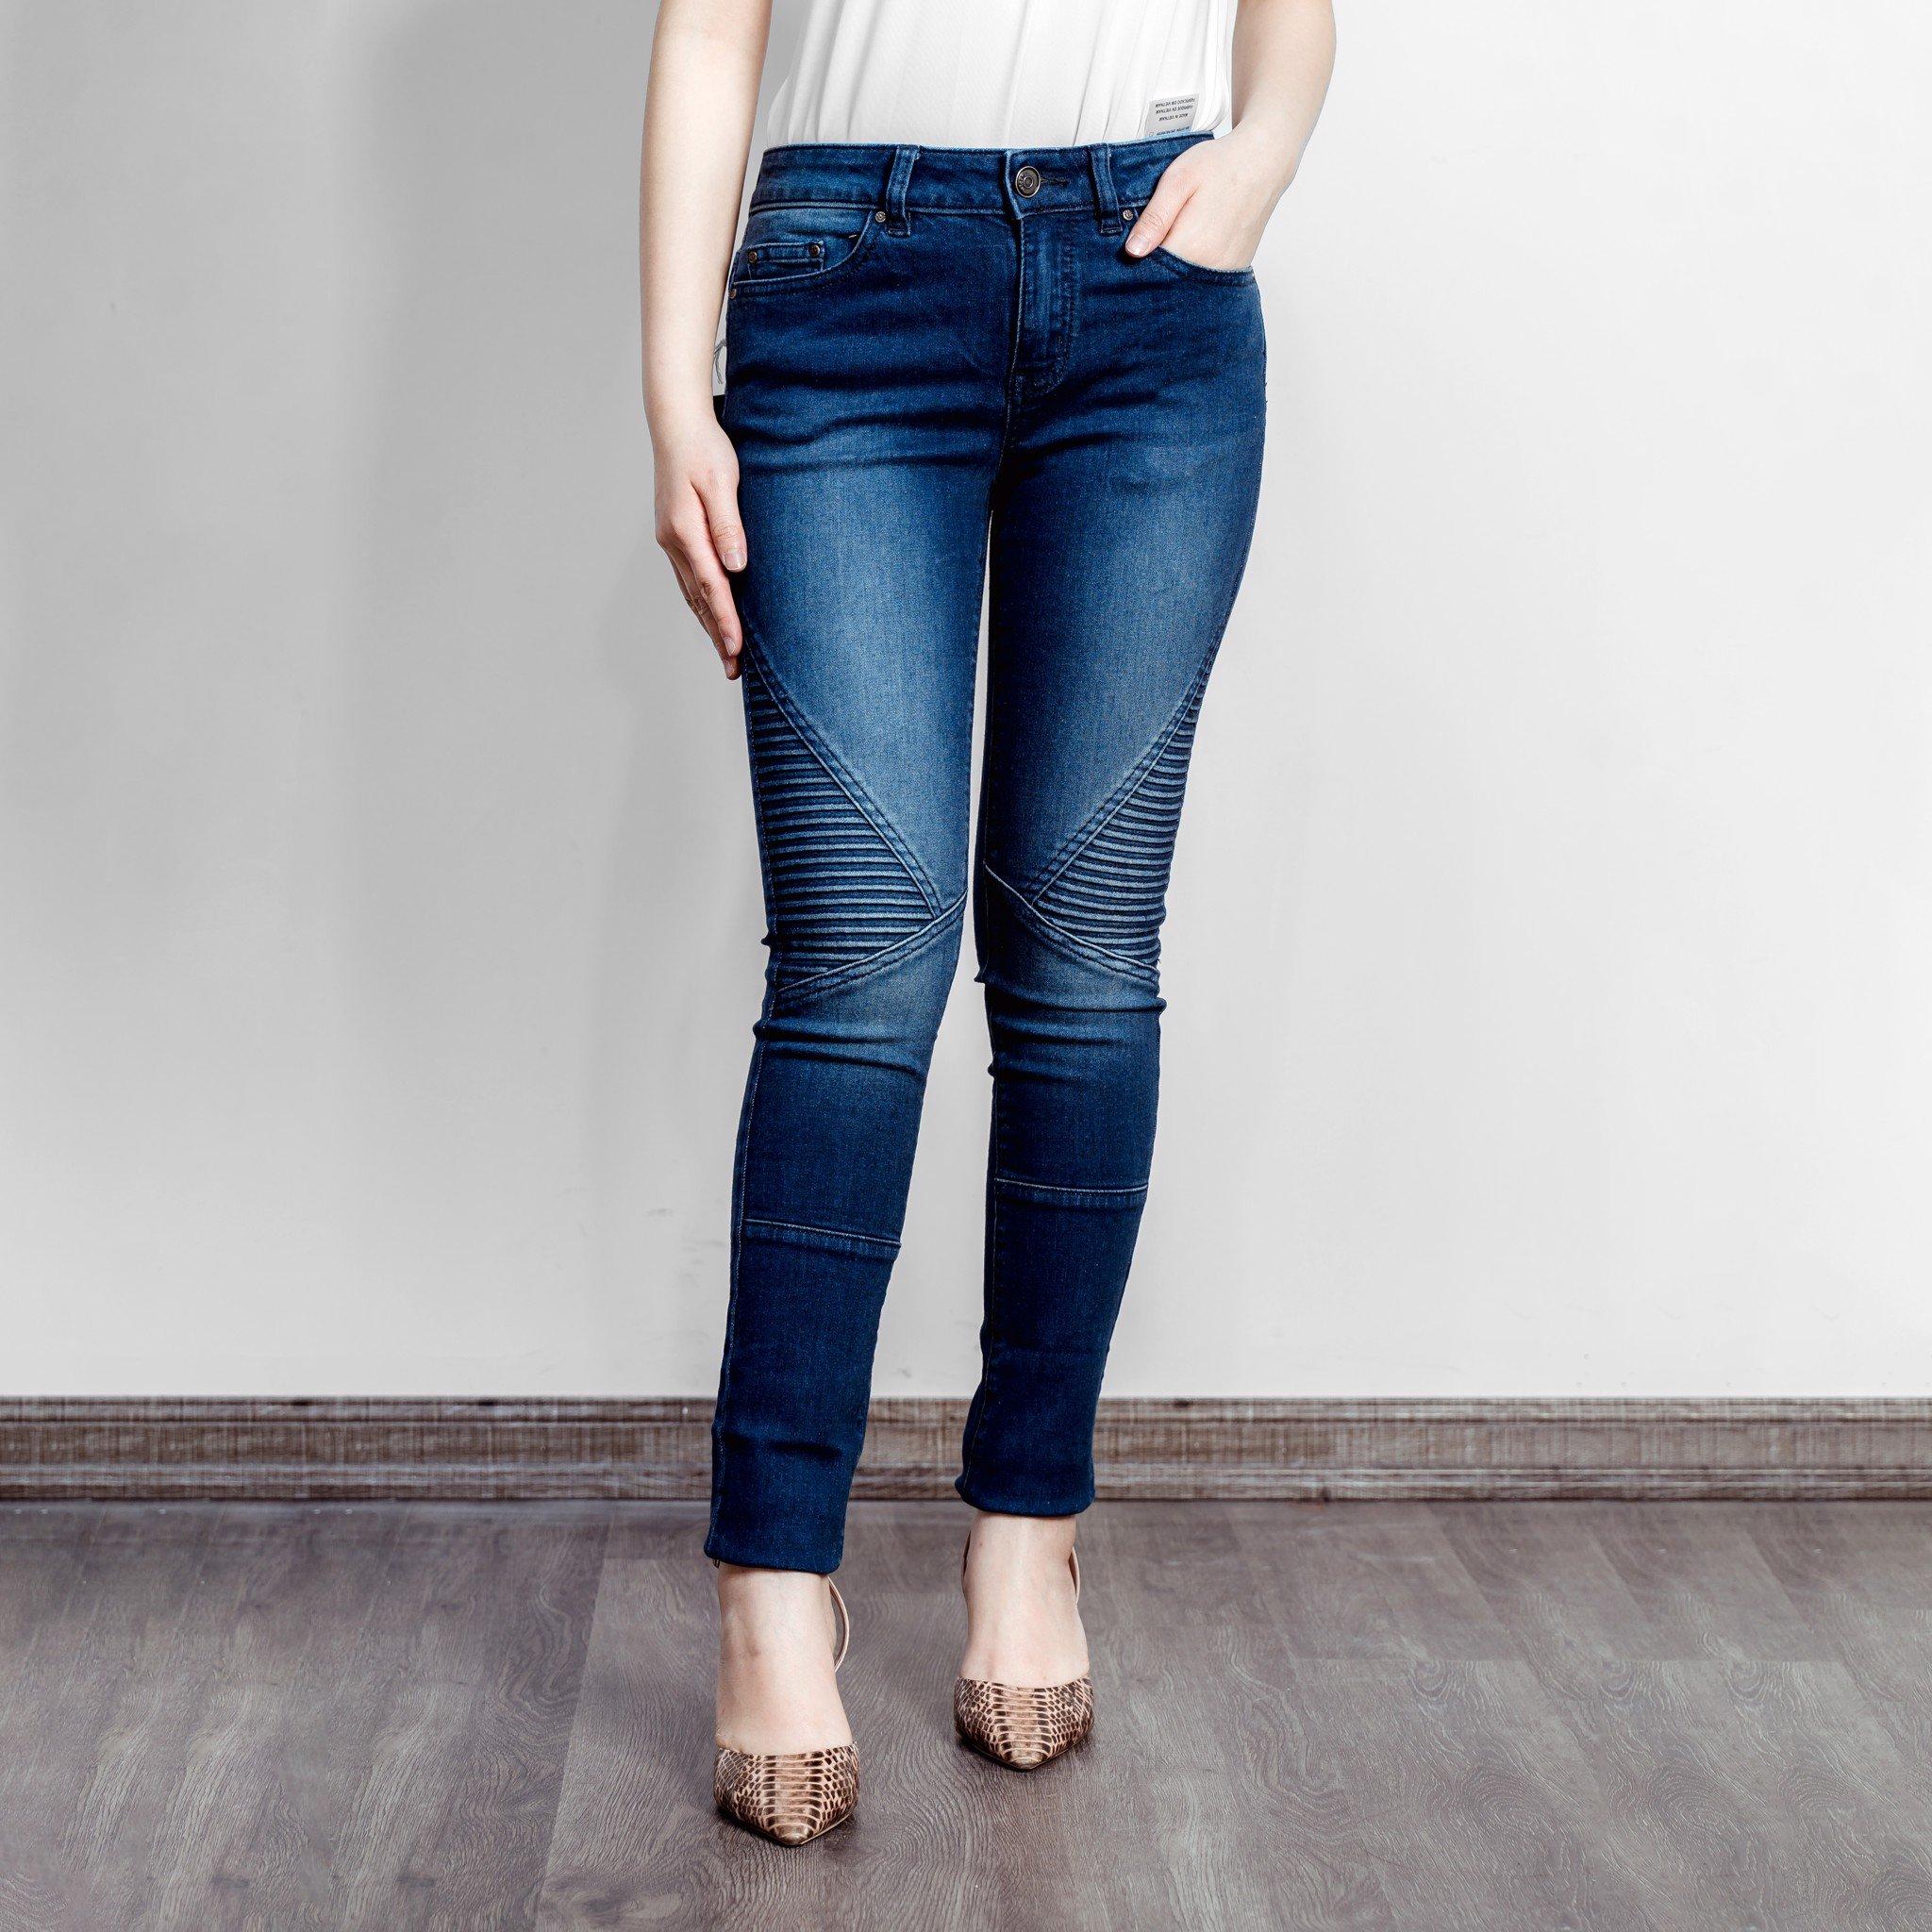 Quần Jean Nữ O.jeans - QJD20020FW